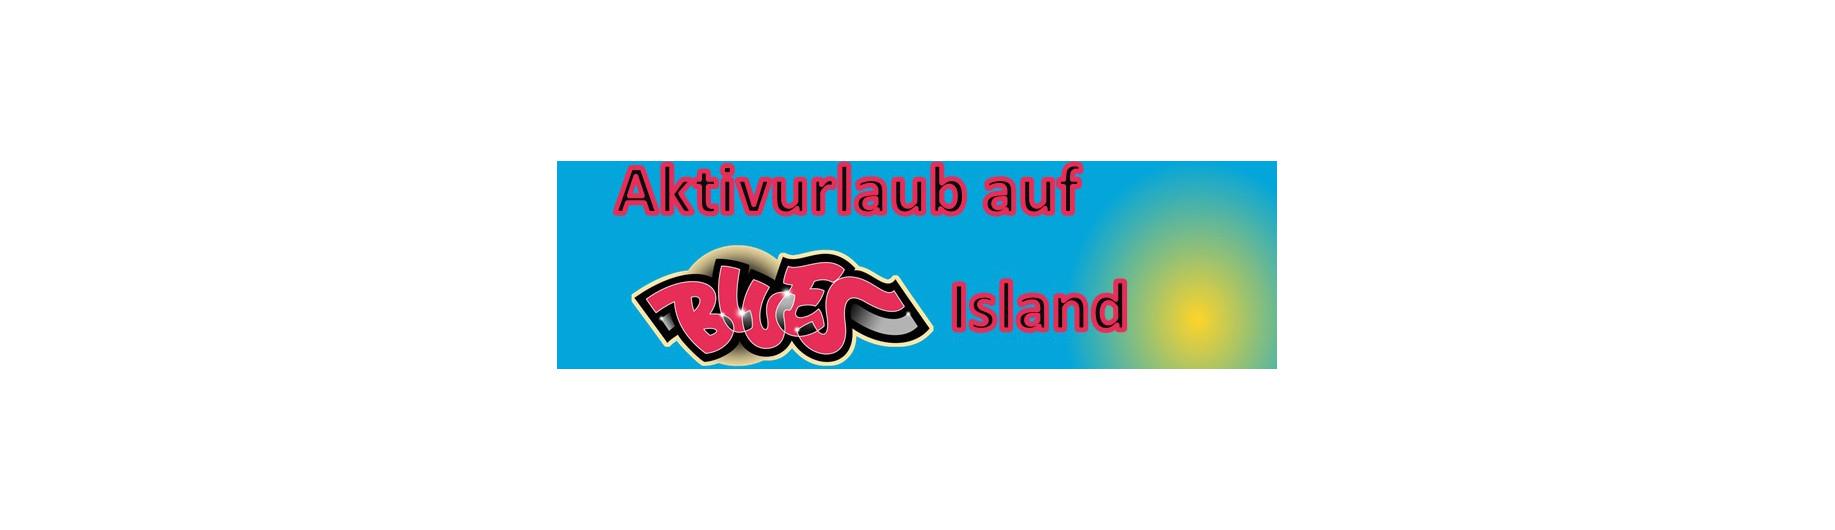 Aktivurlaub auf BLUES Island